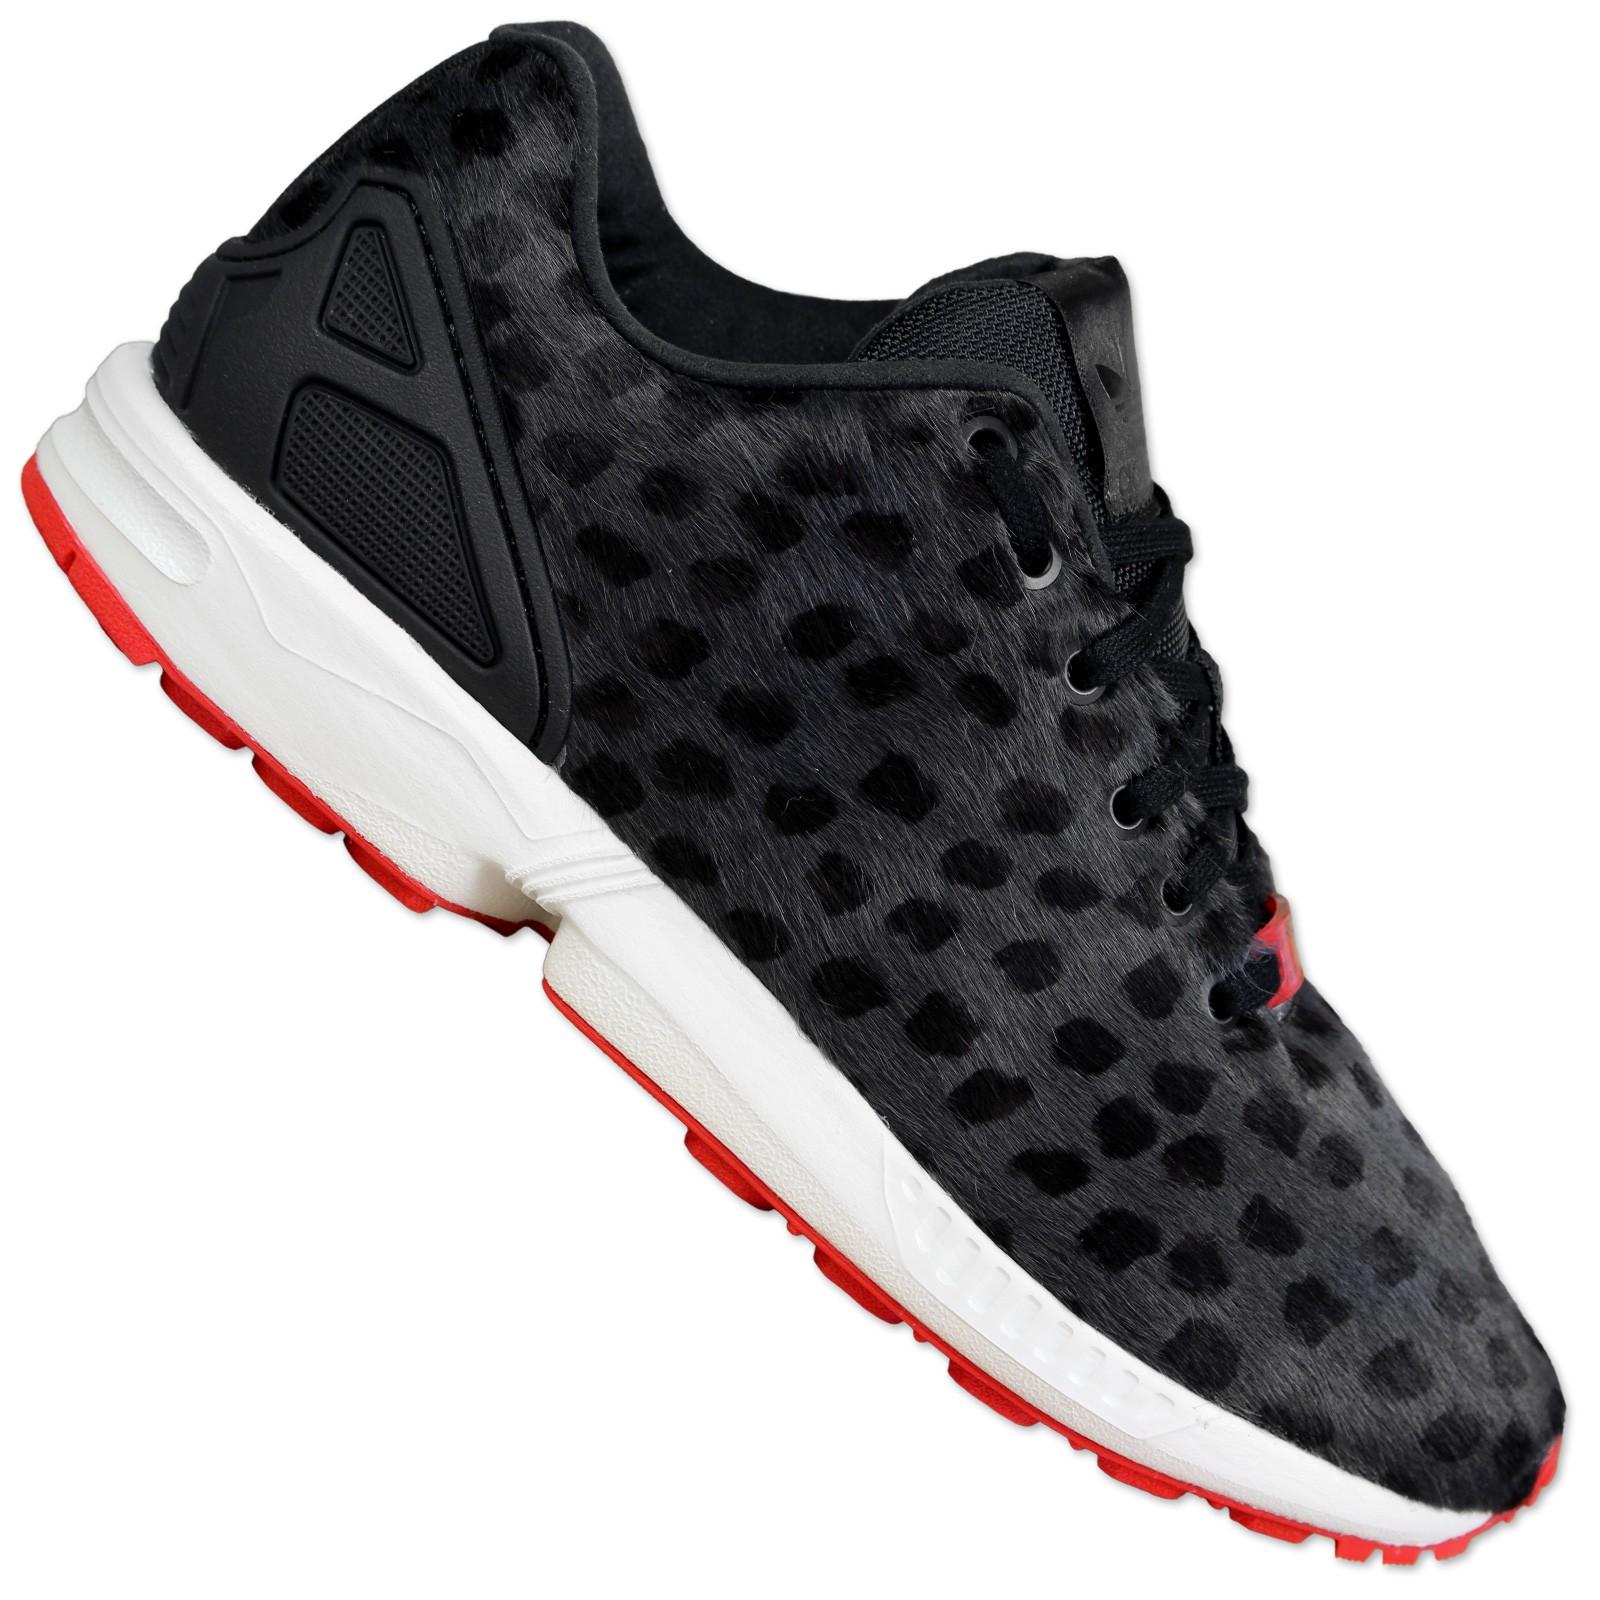 adidas originals zx flux trainers s79083 pony hair black. Black Bedroom Furniture Sets. Home Design Ideas